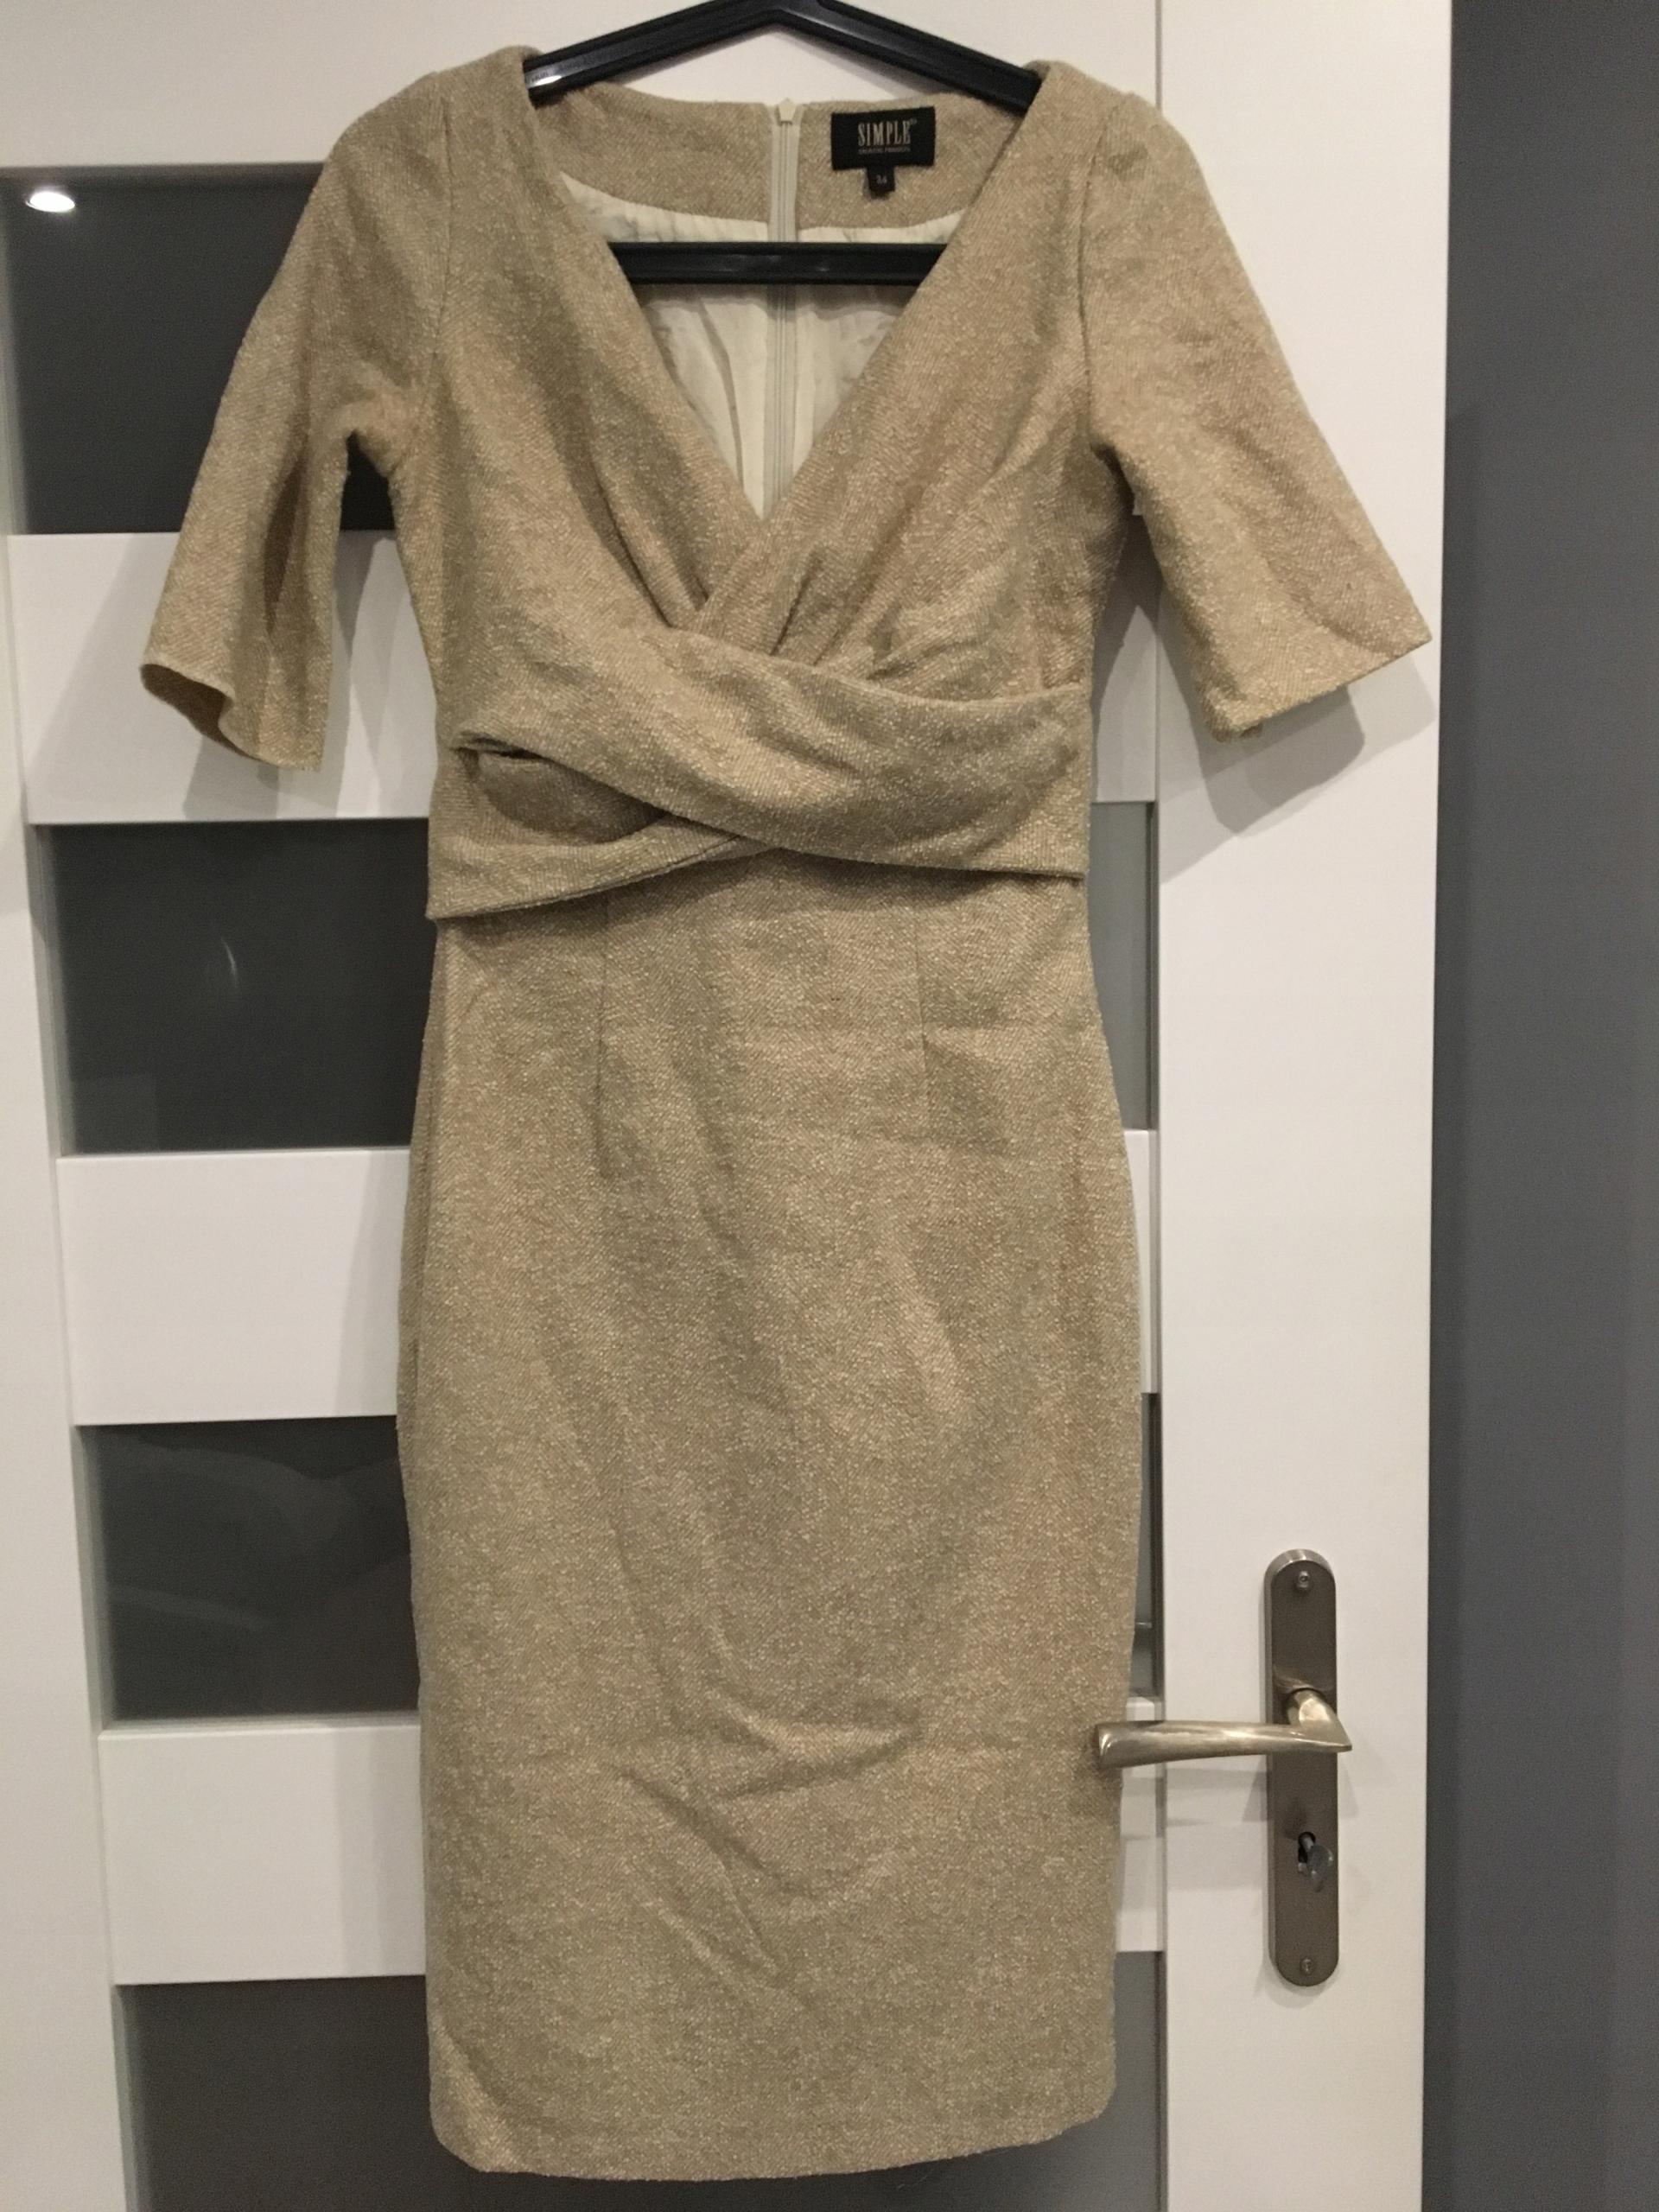 73032d2498 SIMPLE sukienka xs s - 7686226843 - oficjalne archiwum allegro